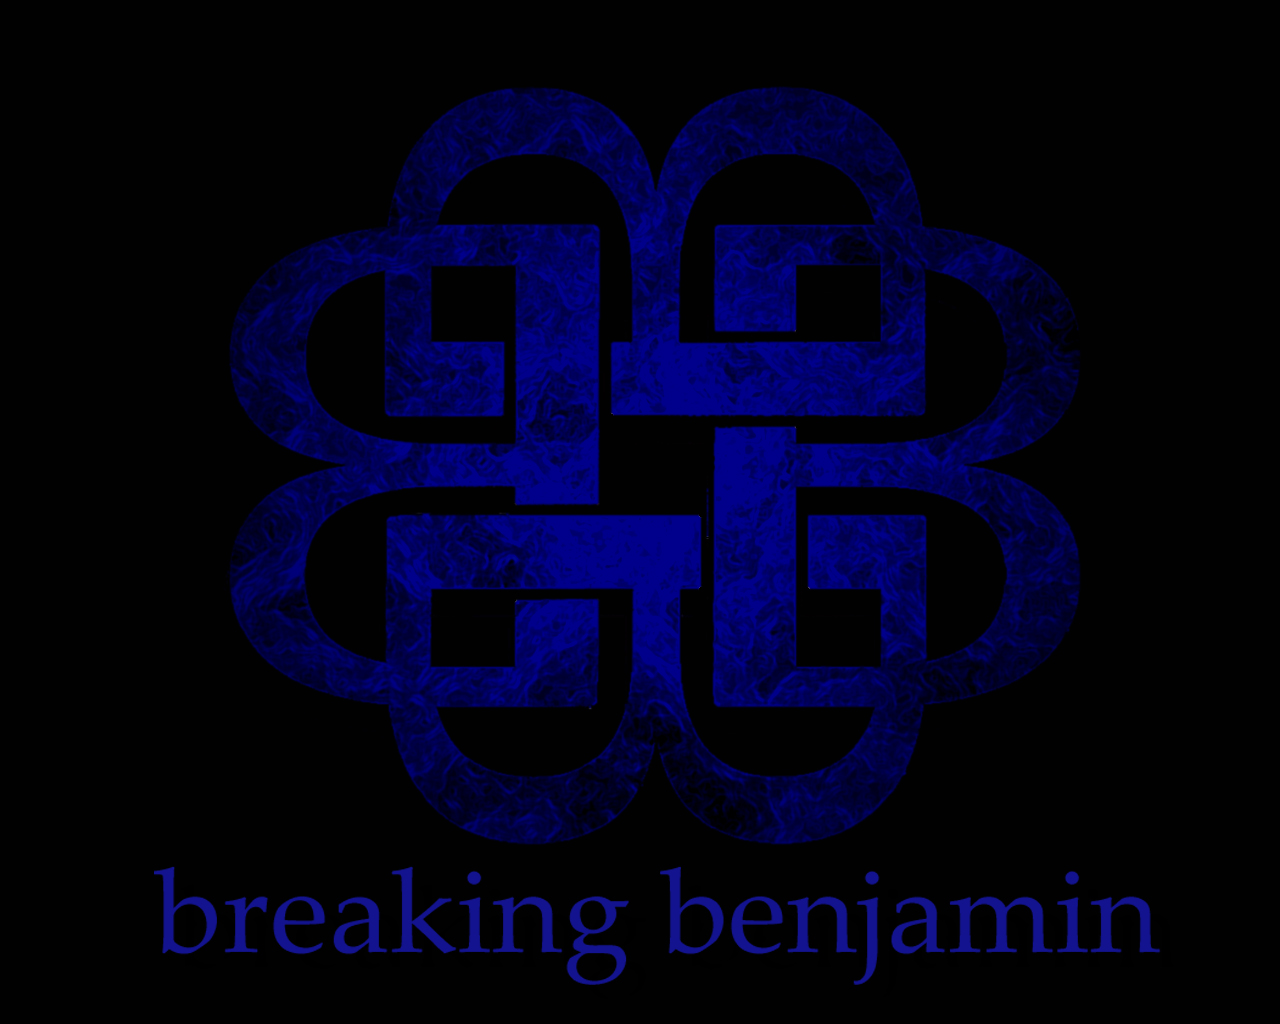 breaking benjamin wallpaper home breaking benjamin wallpaper go braves 1280x1024